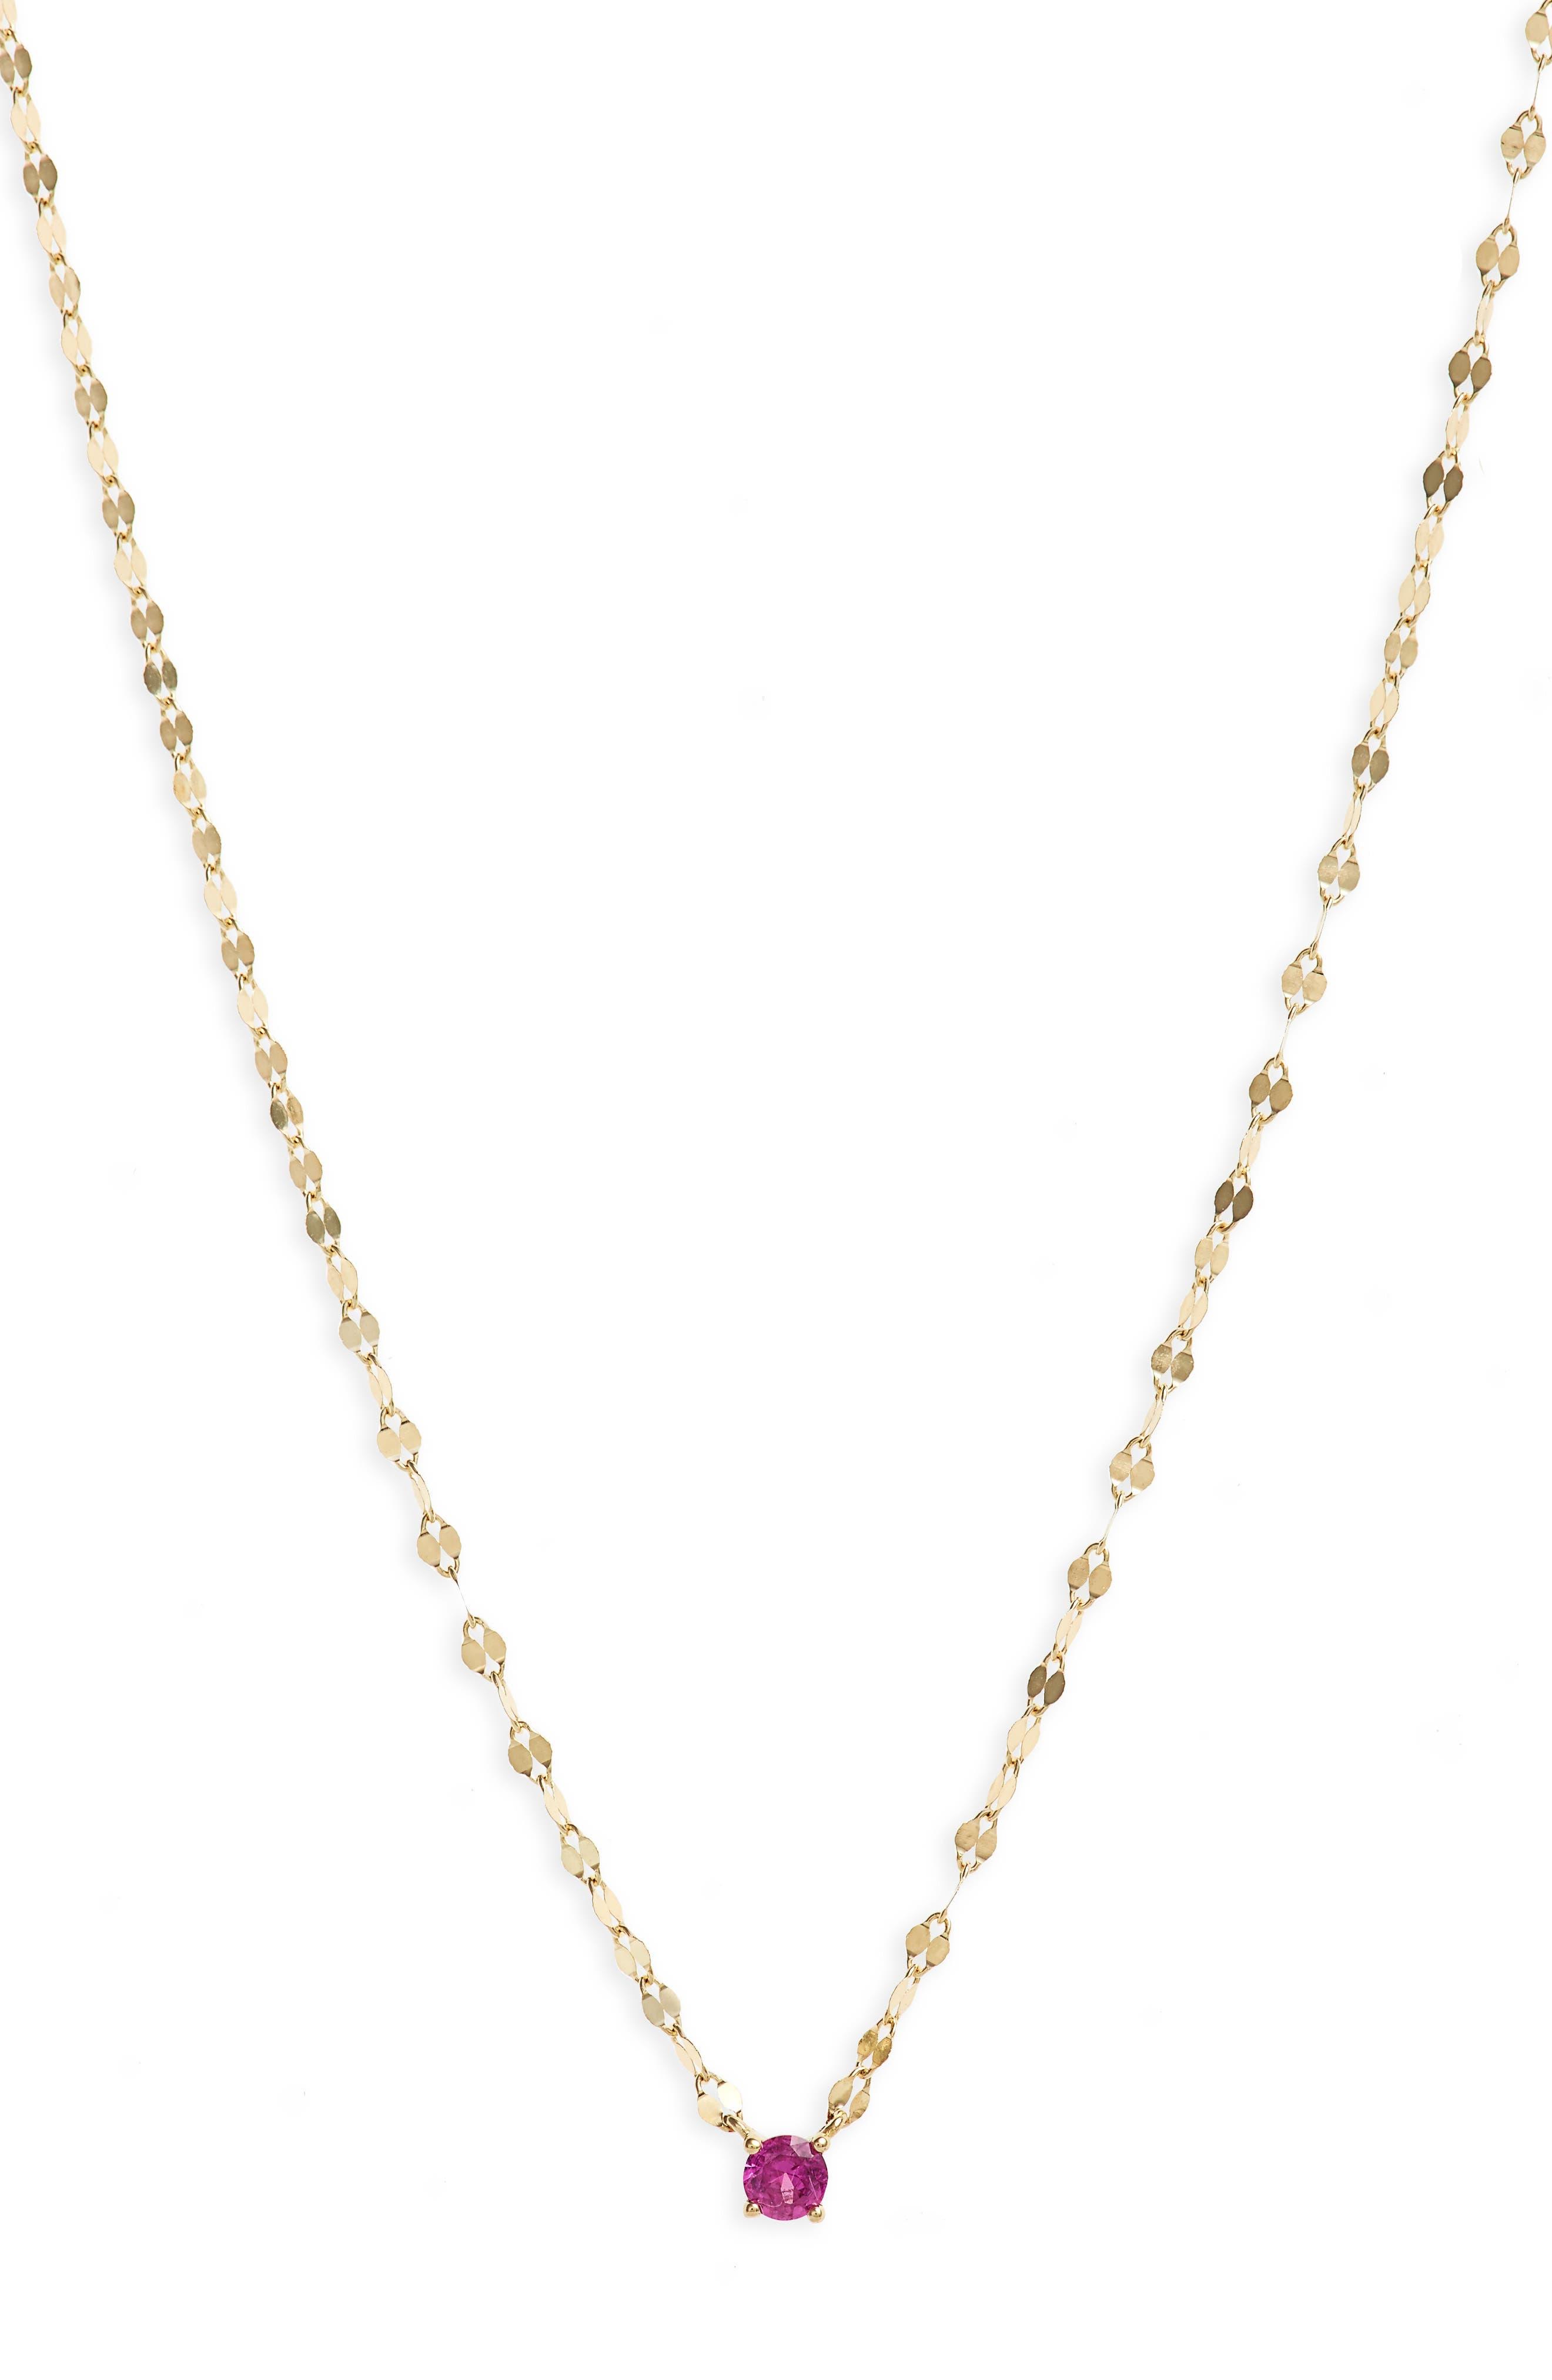 Main Image - Lana Girl by Lana Jewelry Sapphire Pendant Necklace (Girls)